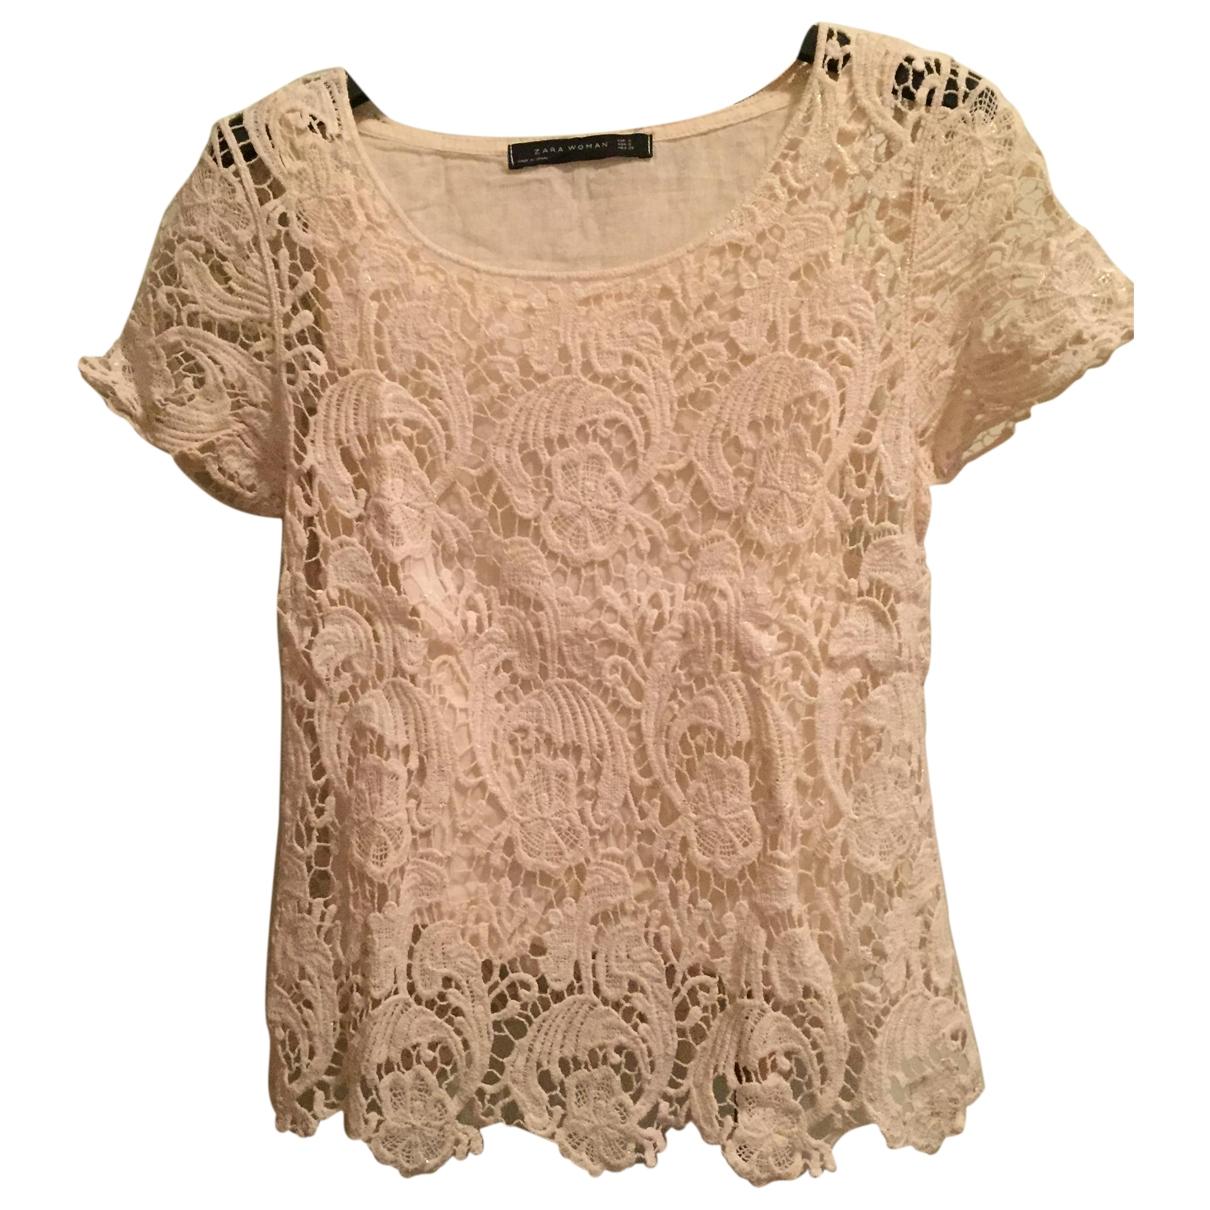 Zara \N Beige Cotton  top for Women S International